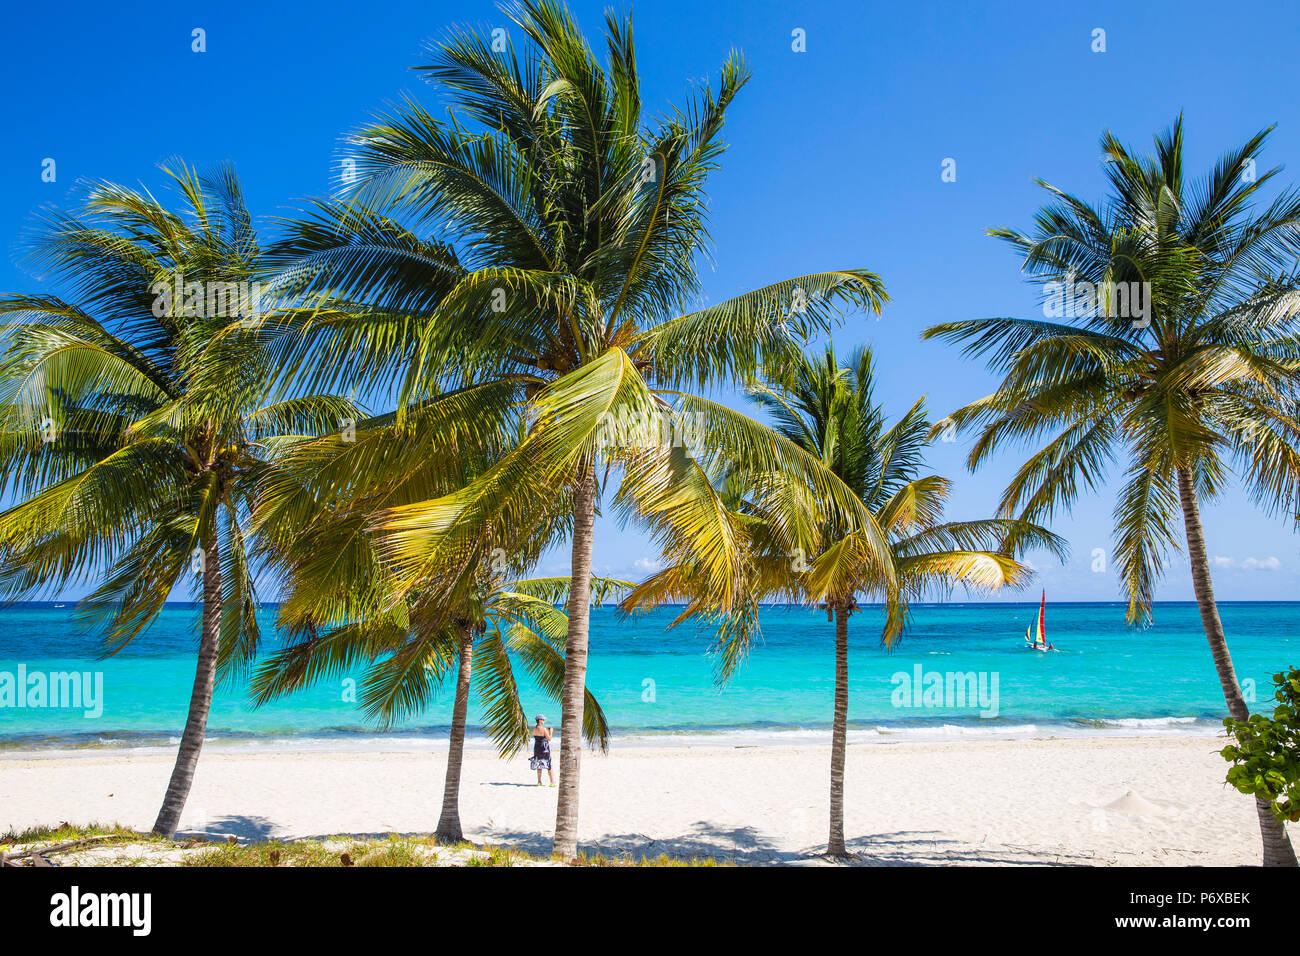 Cuba, Holguín, Playa Esmeralda Immagini Stock